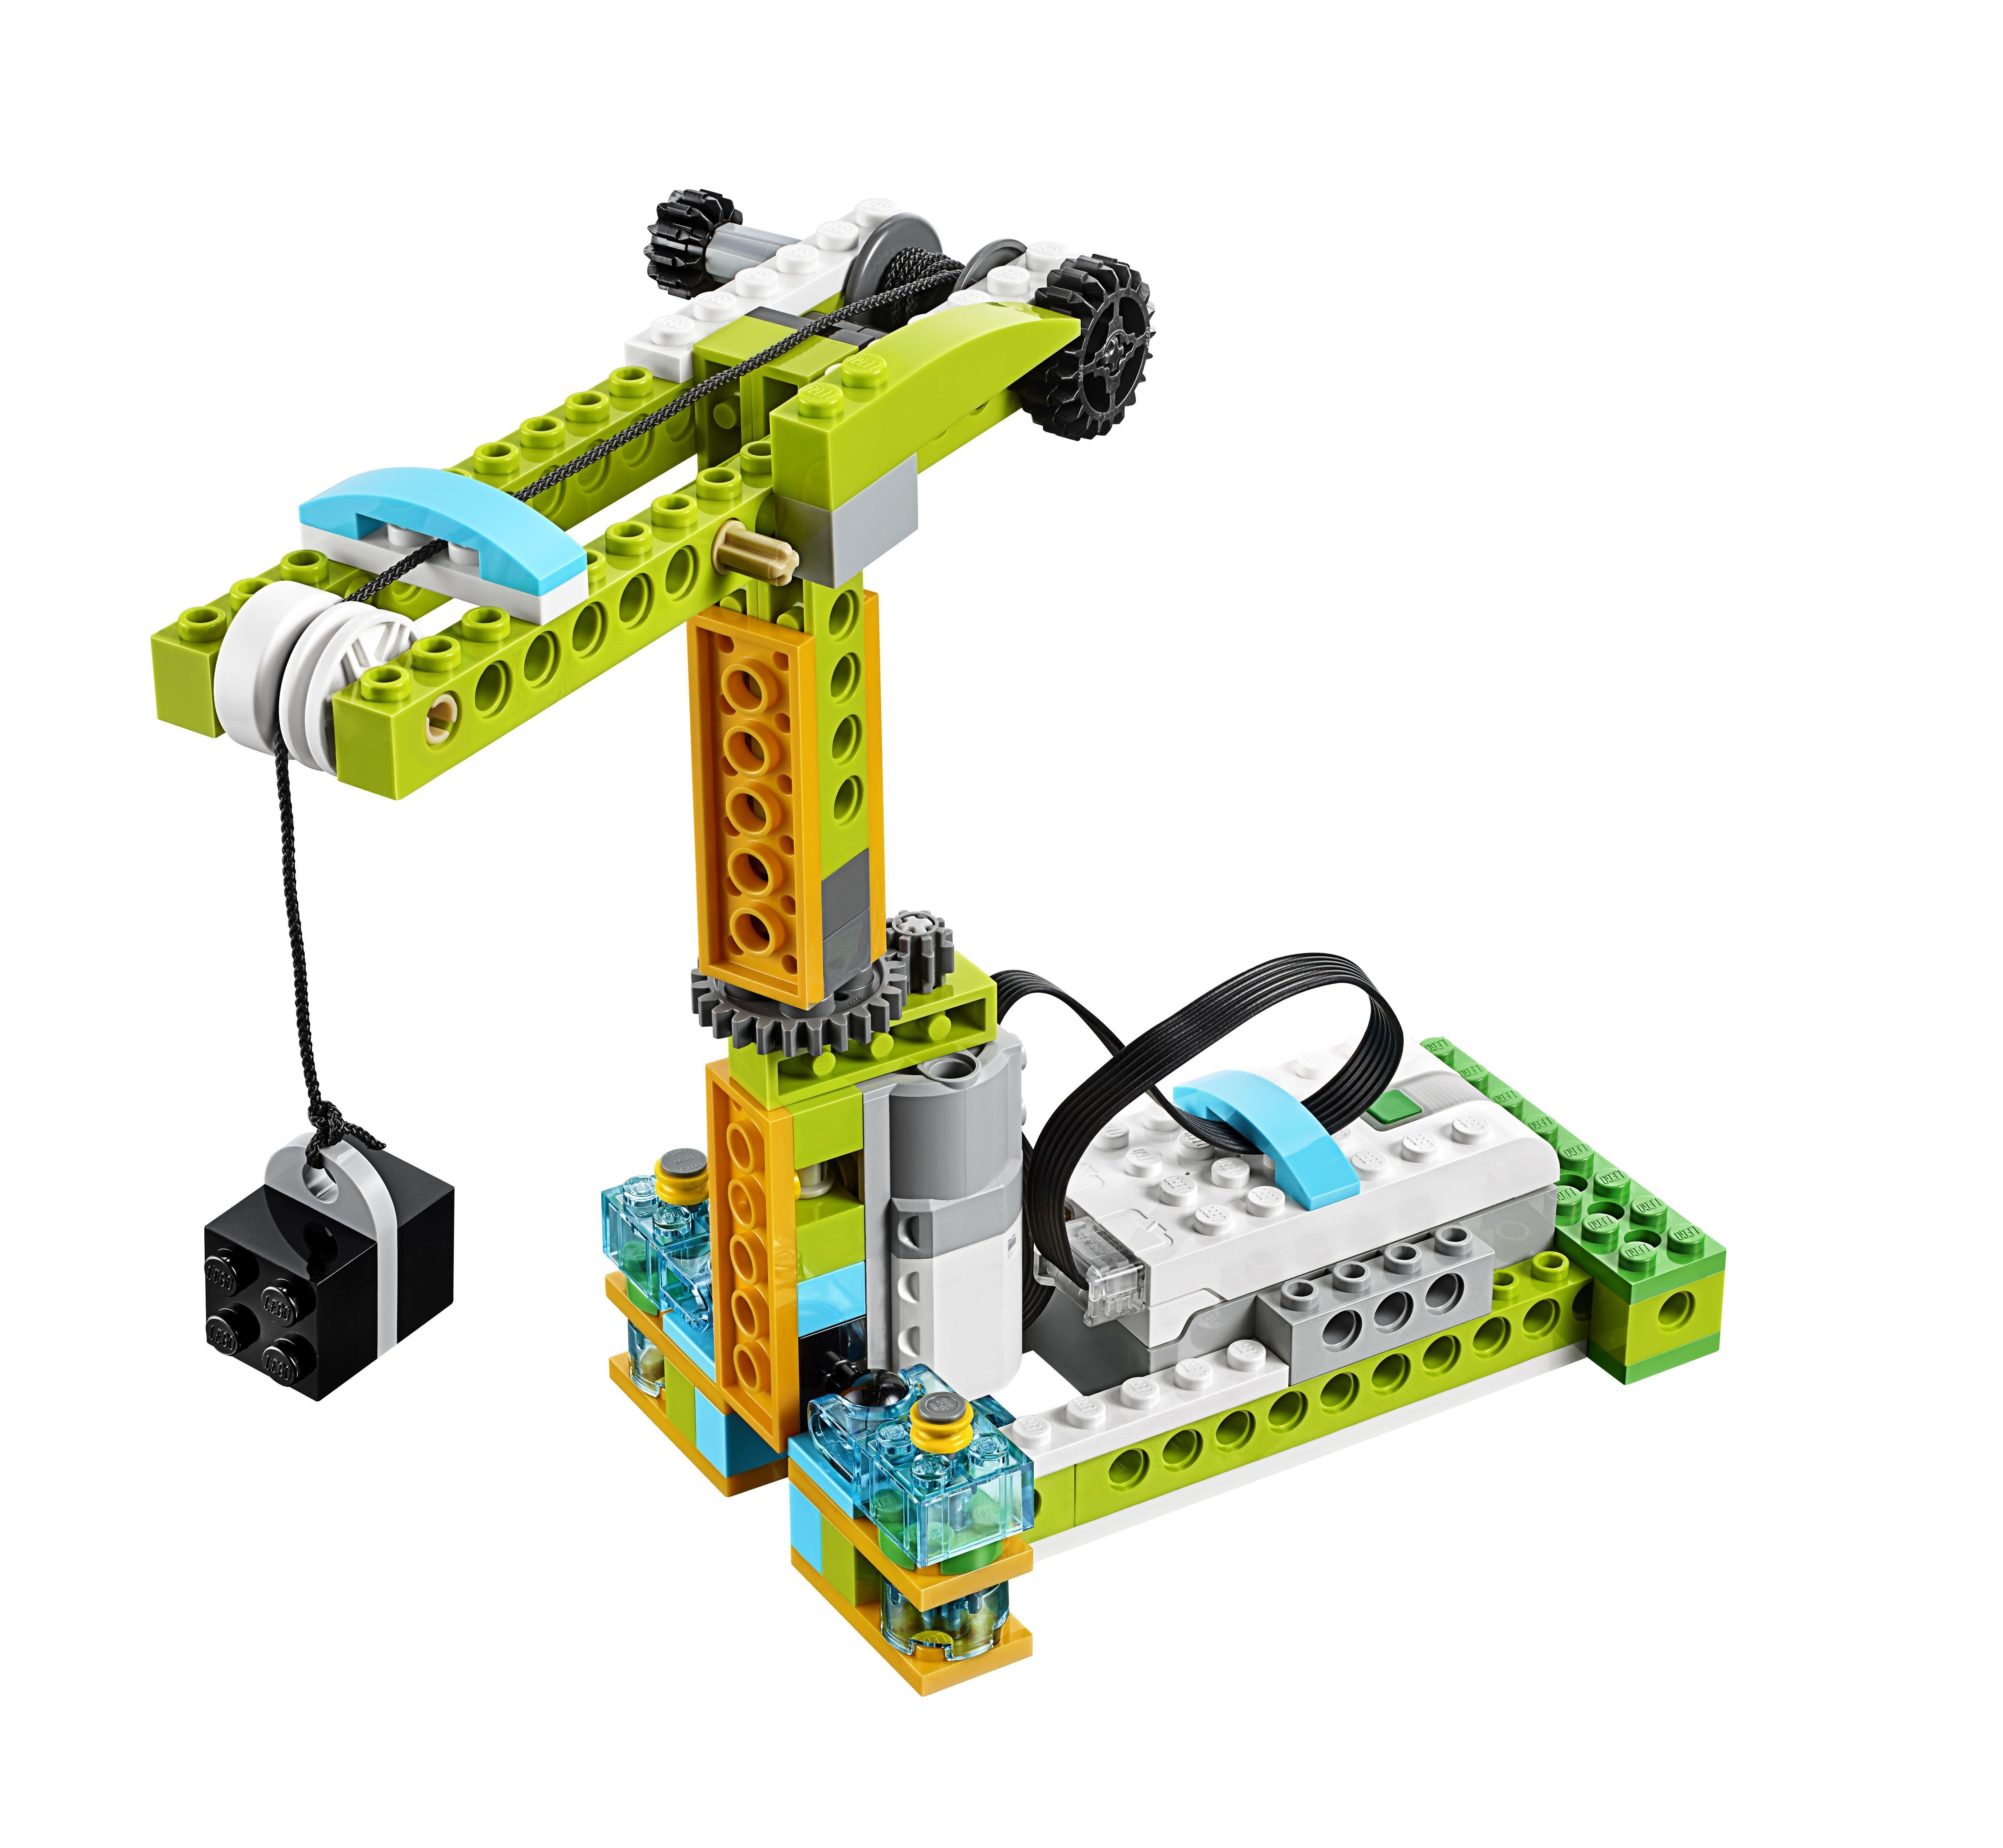 Lego Wedo 2.0 Crane